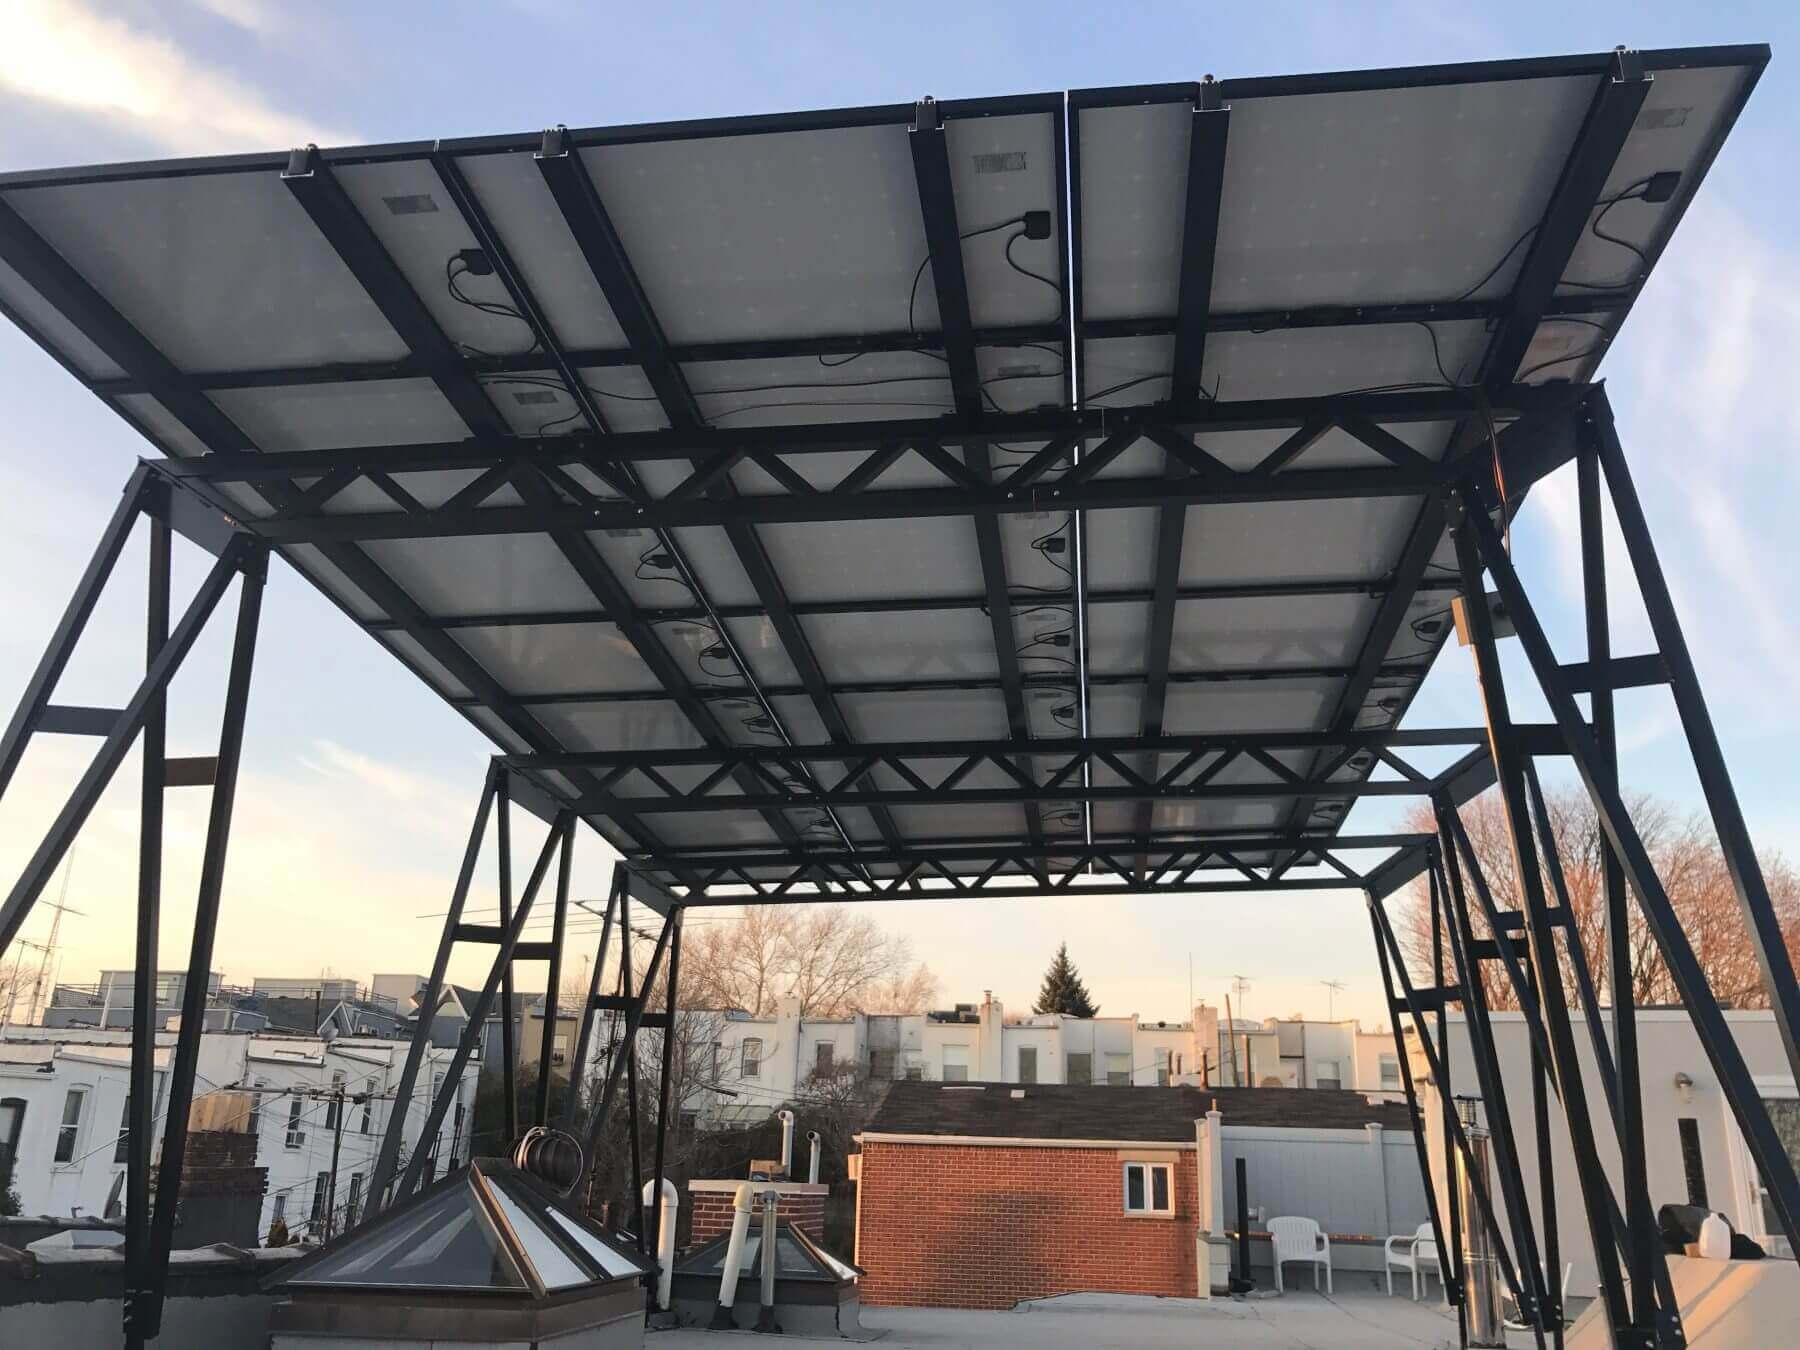 Assembled solar panels